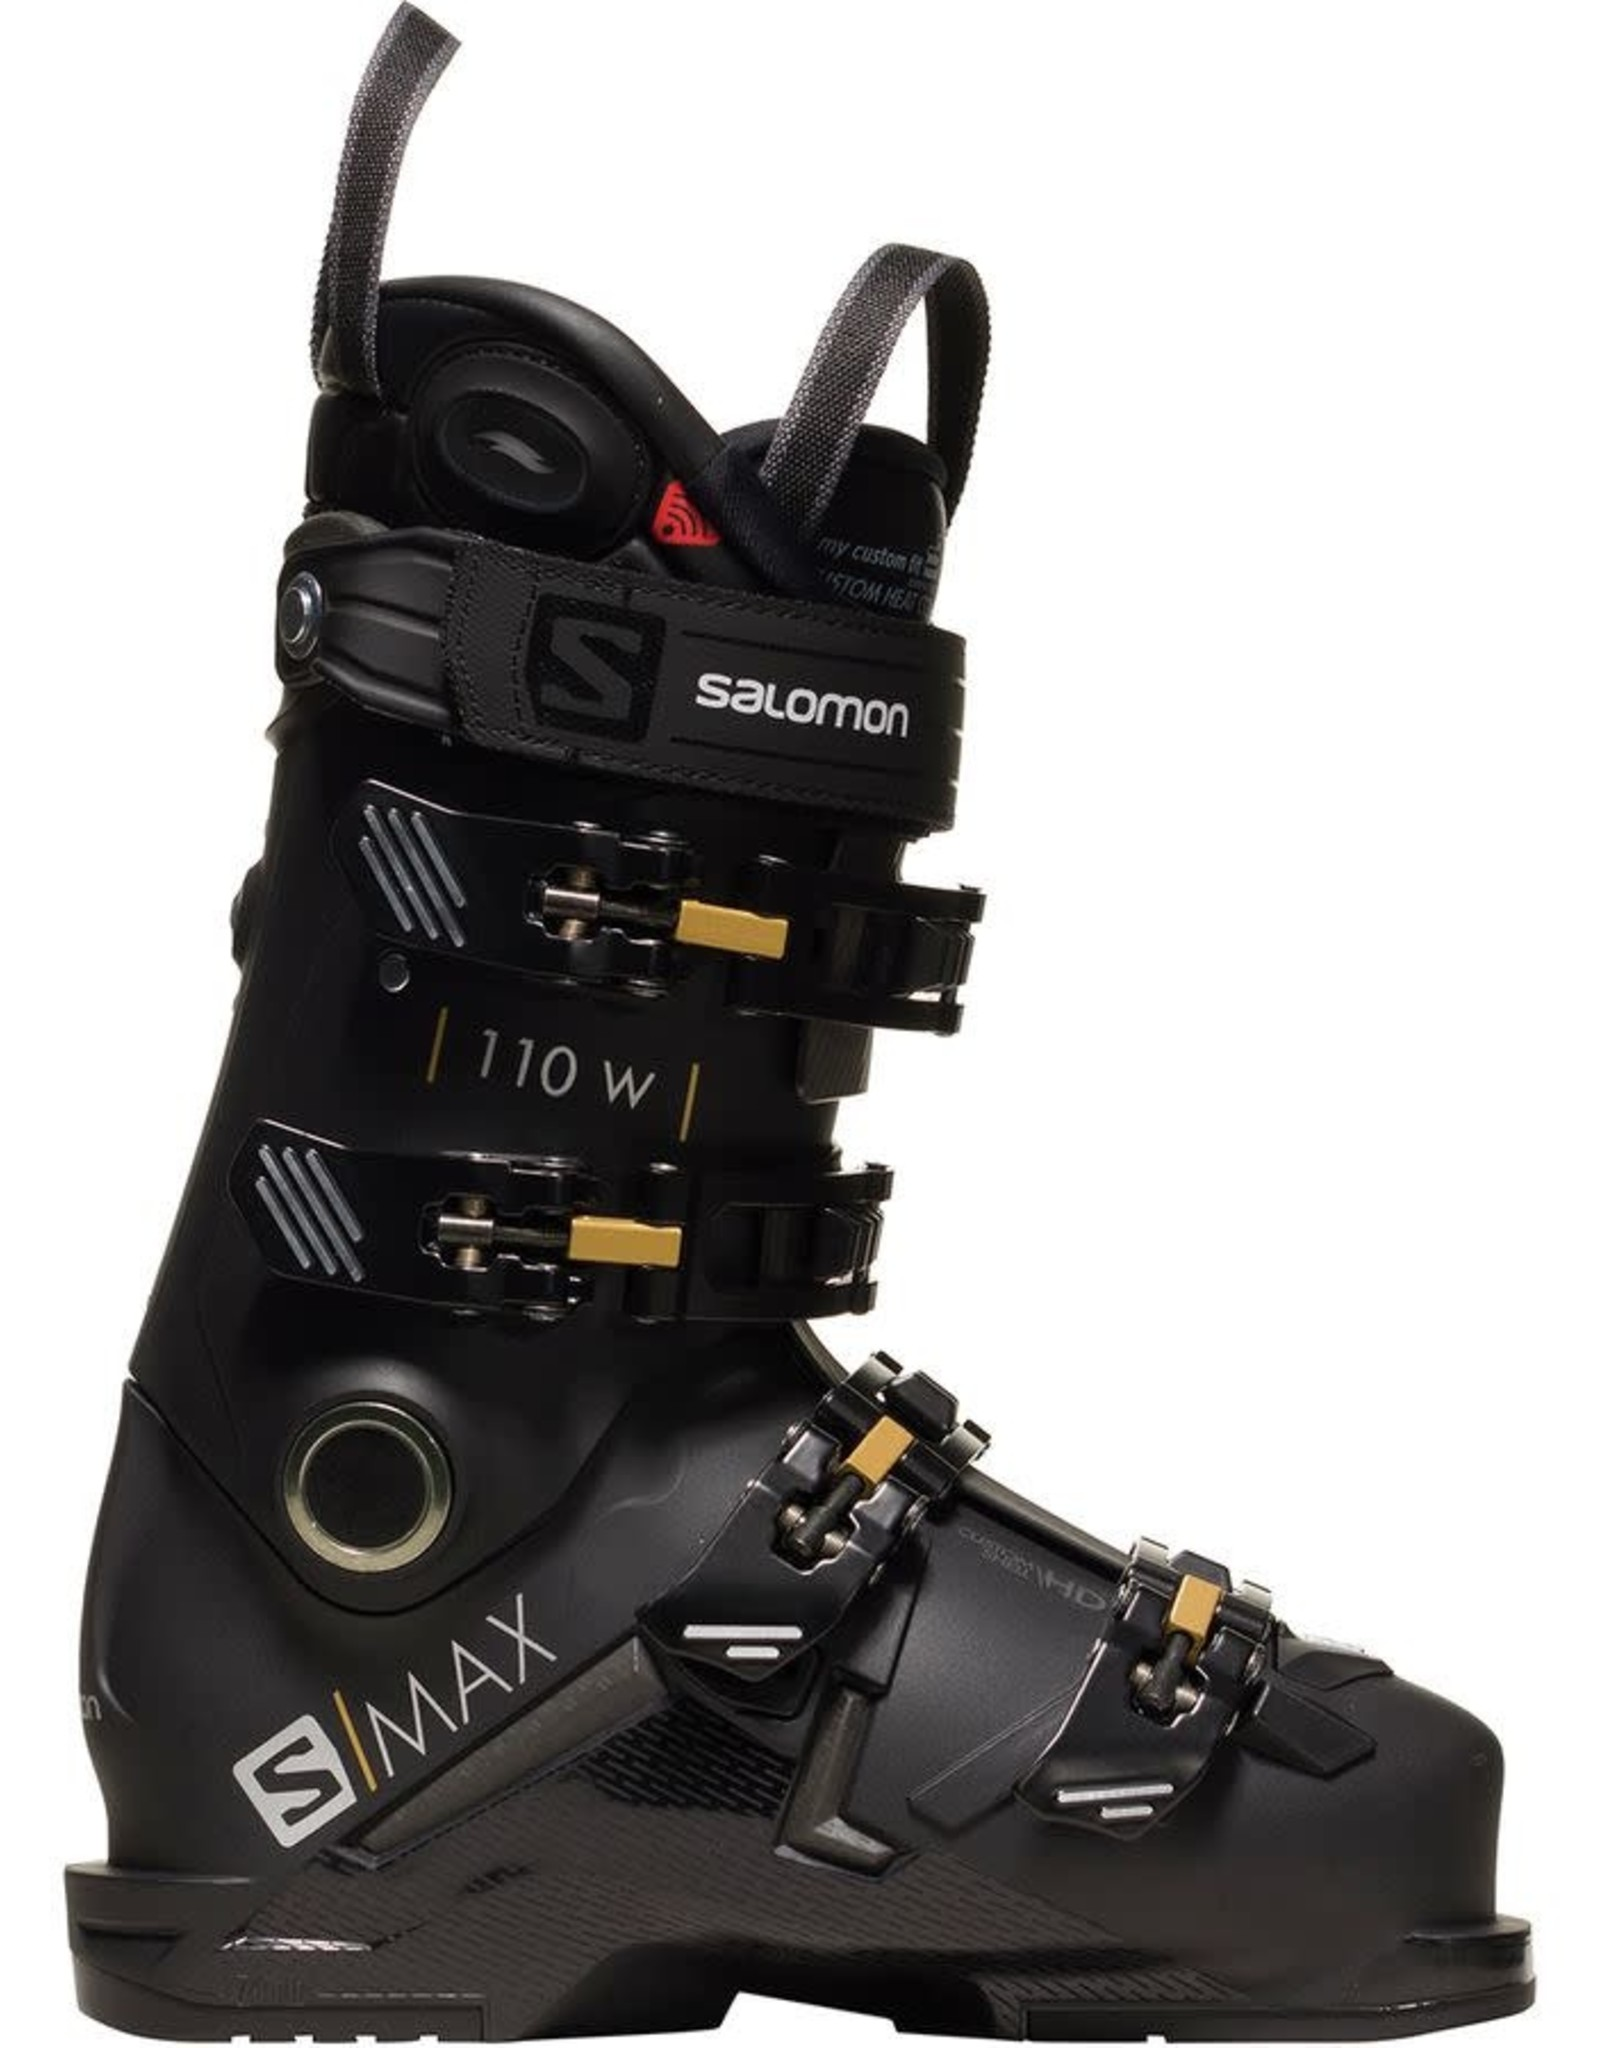 Salomon SALOMON Ski Boots S/MAX 110 W (19/20)